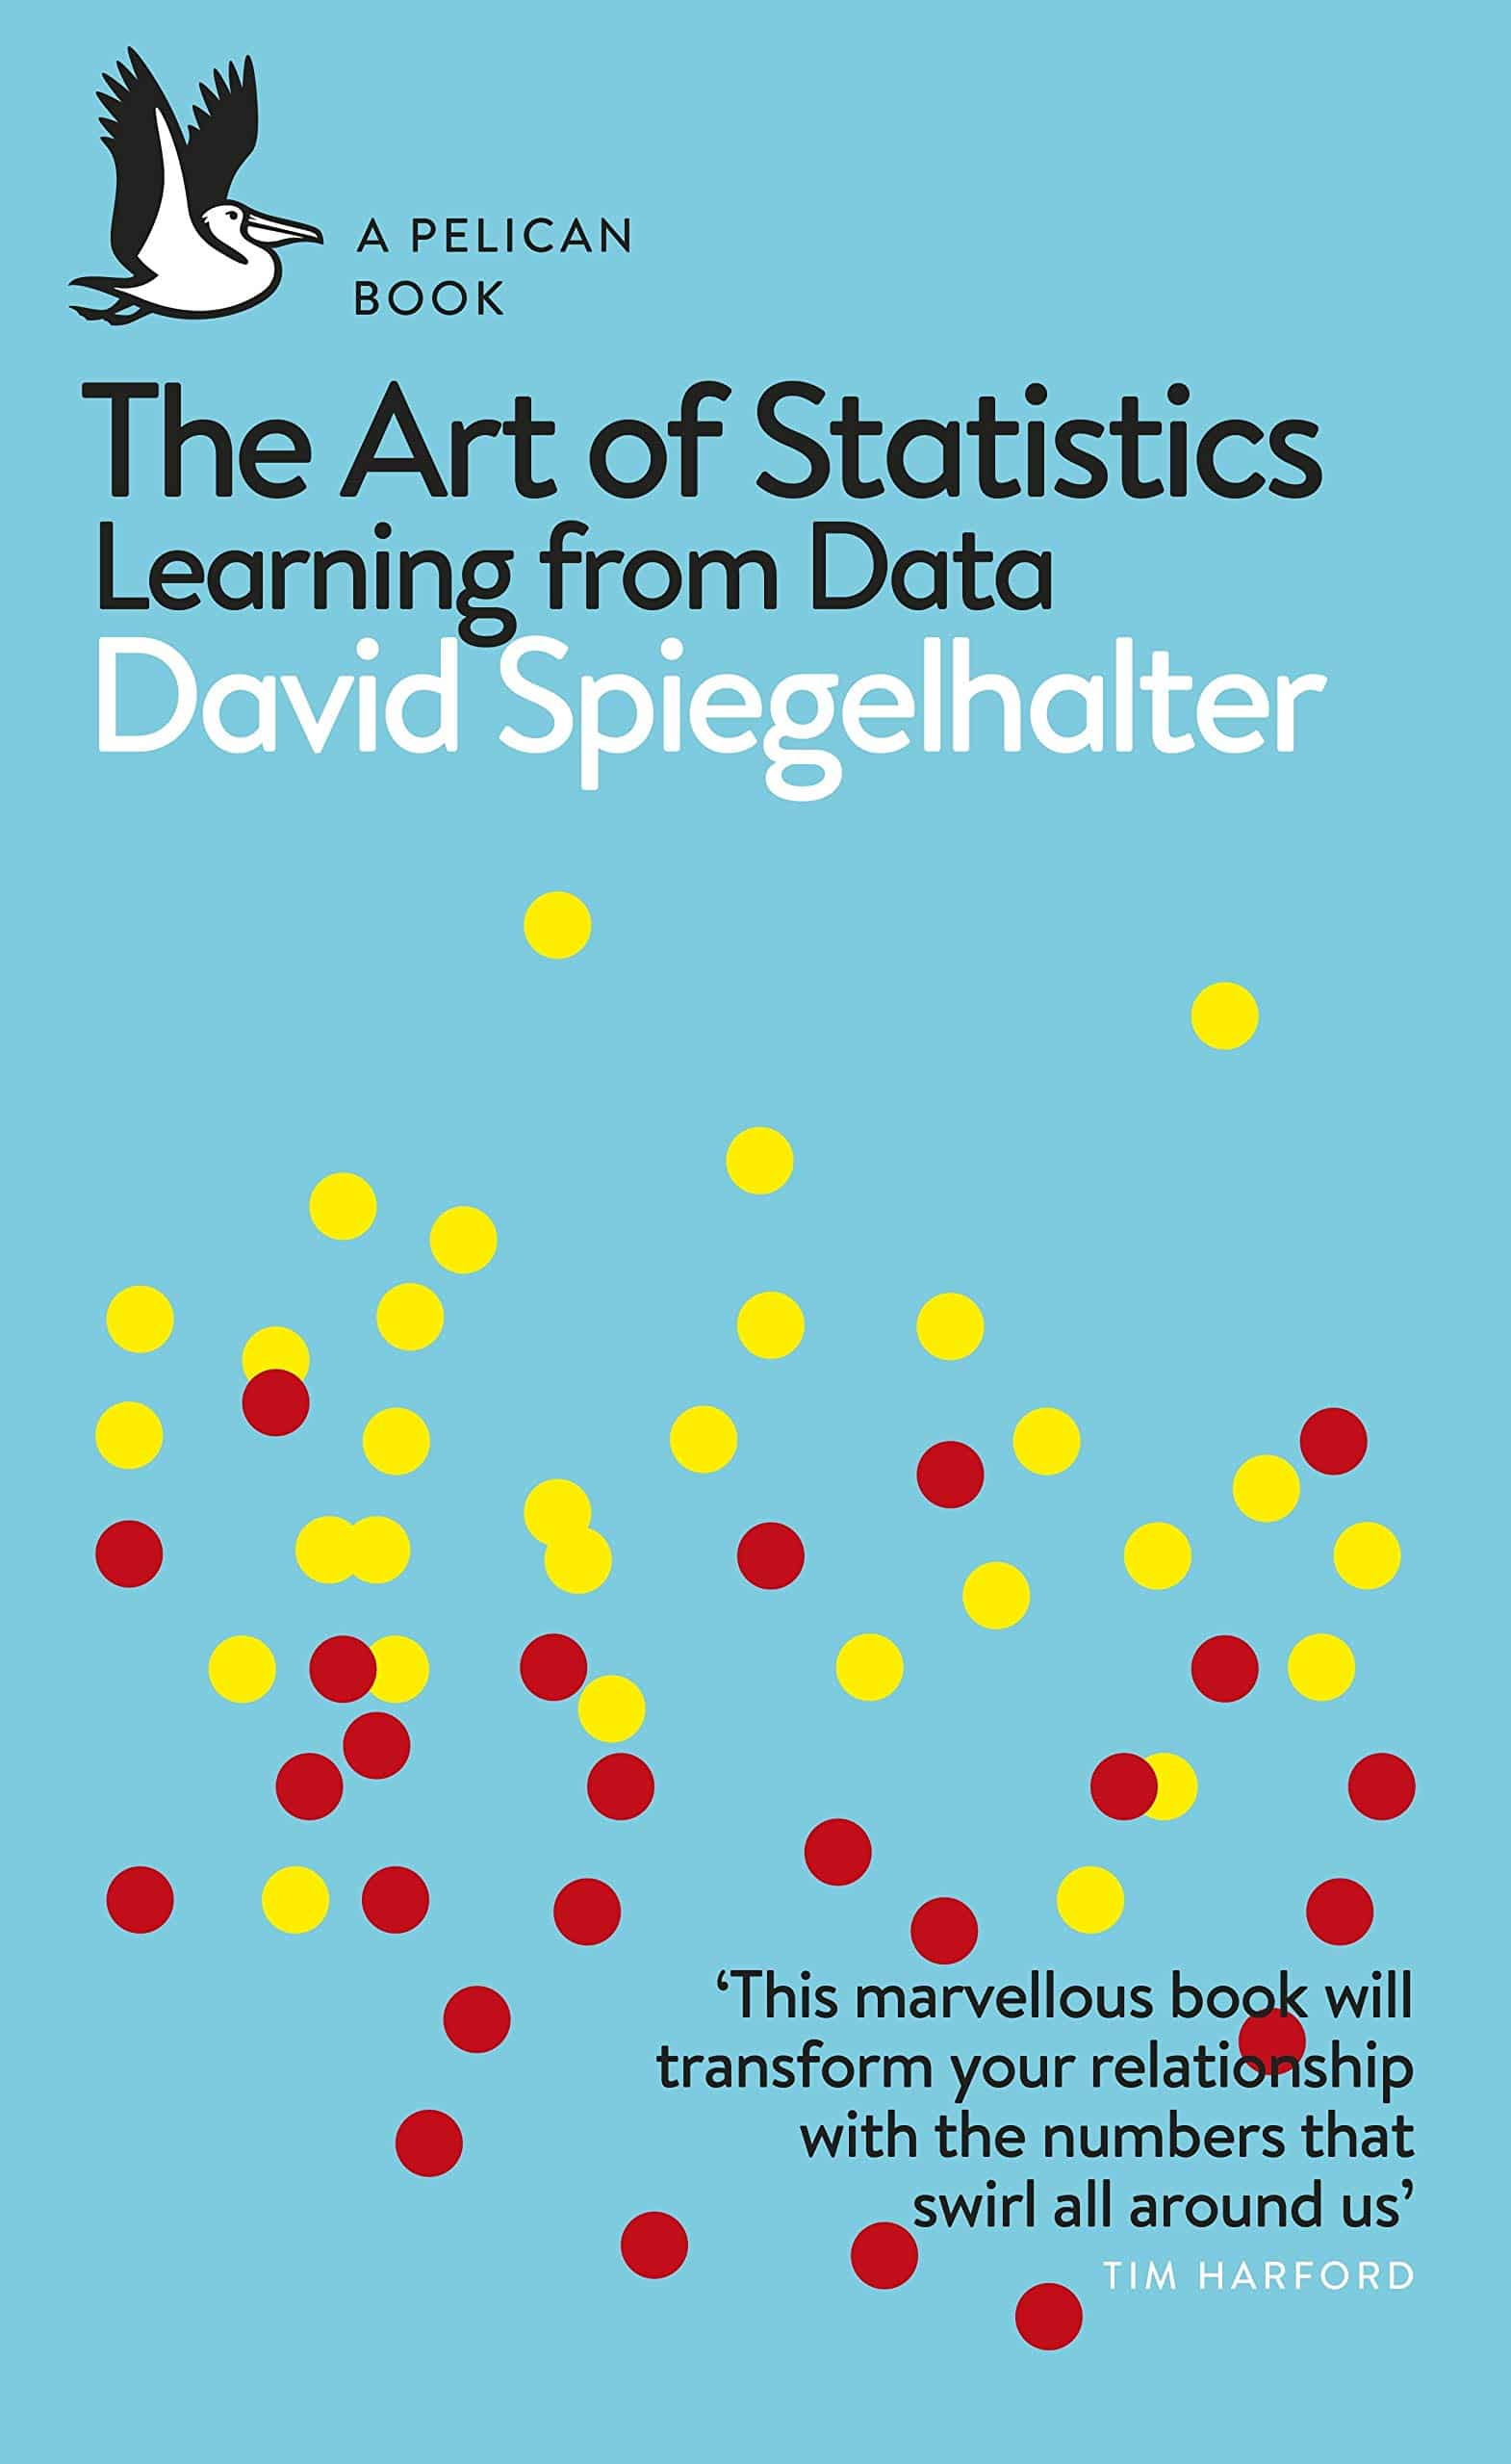 Art of Statistics review